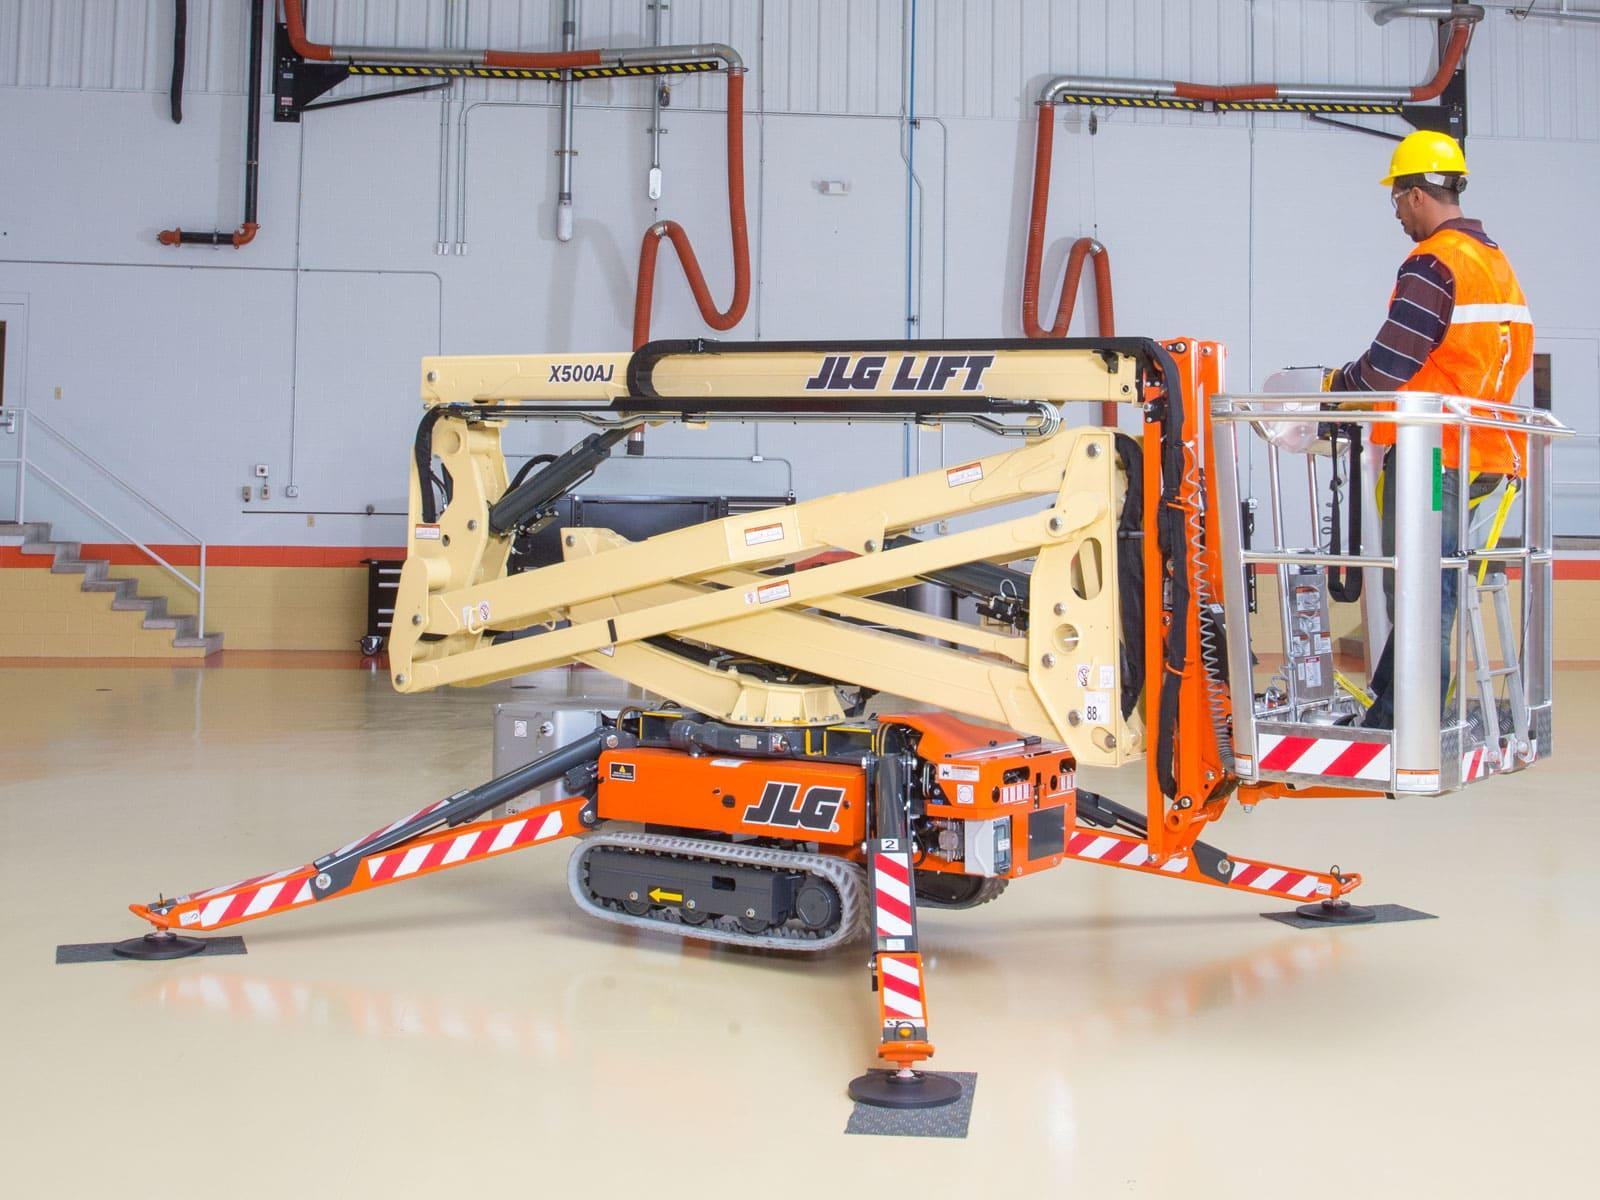 X500AJ Compact Crawler Boom Lift | JLG